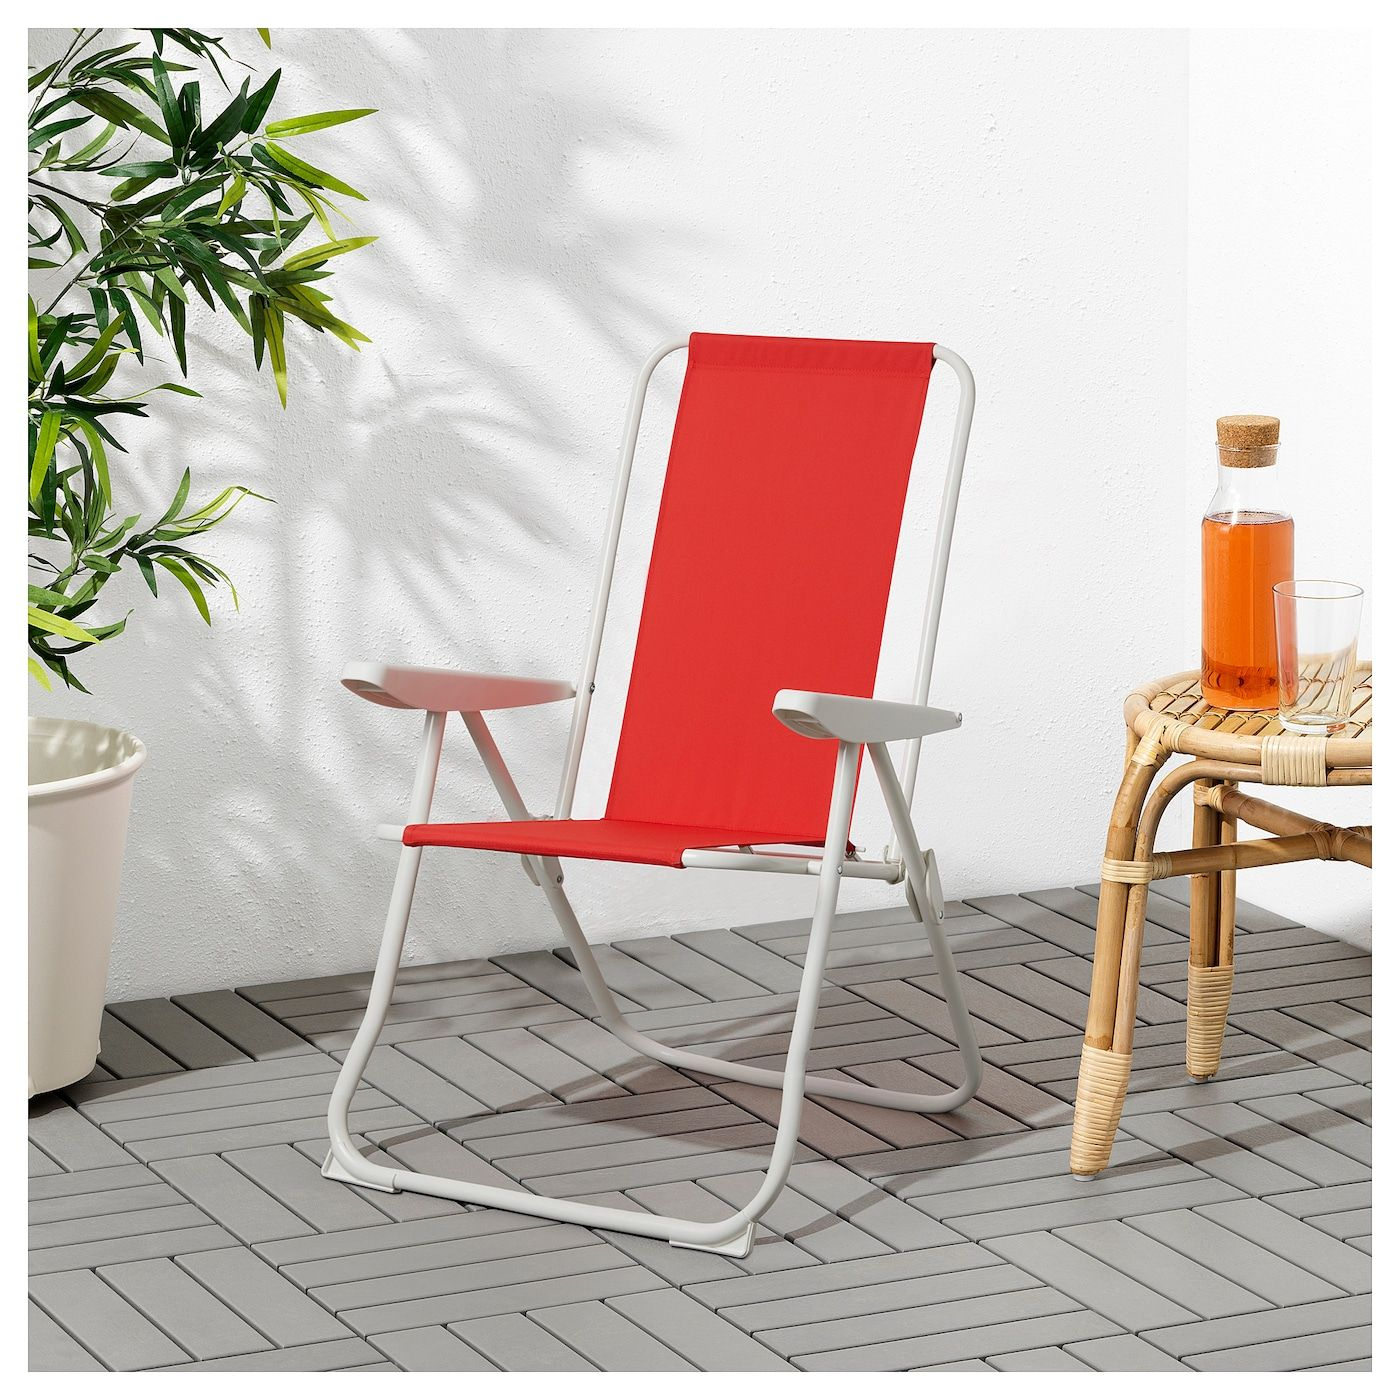 Håmö Reclining Chair - Red | Chaise Fauteuil, Fauteuil ... encequiconcerne Transat Jardin Ikea